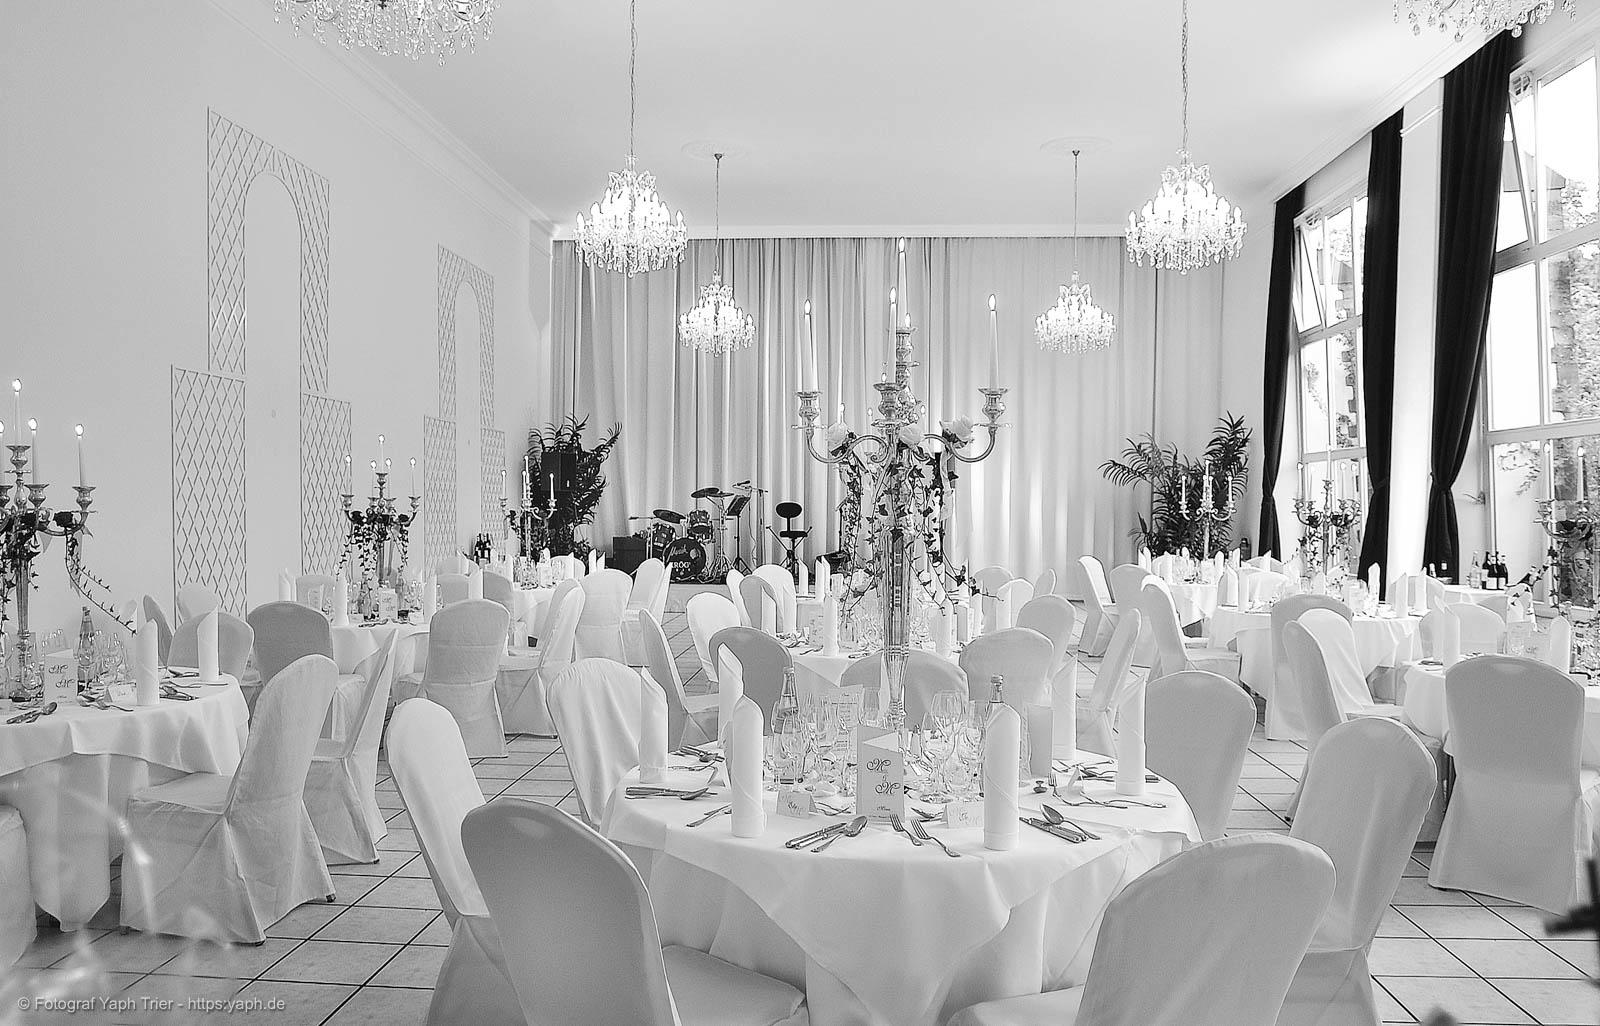 Orangerie Nells Park Hotel Fotograf Trier - Yaph